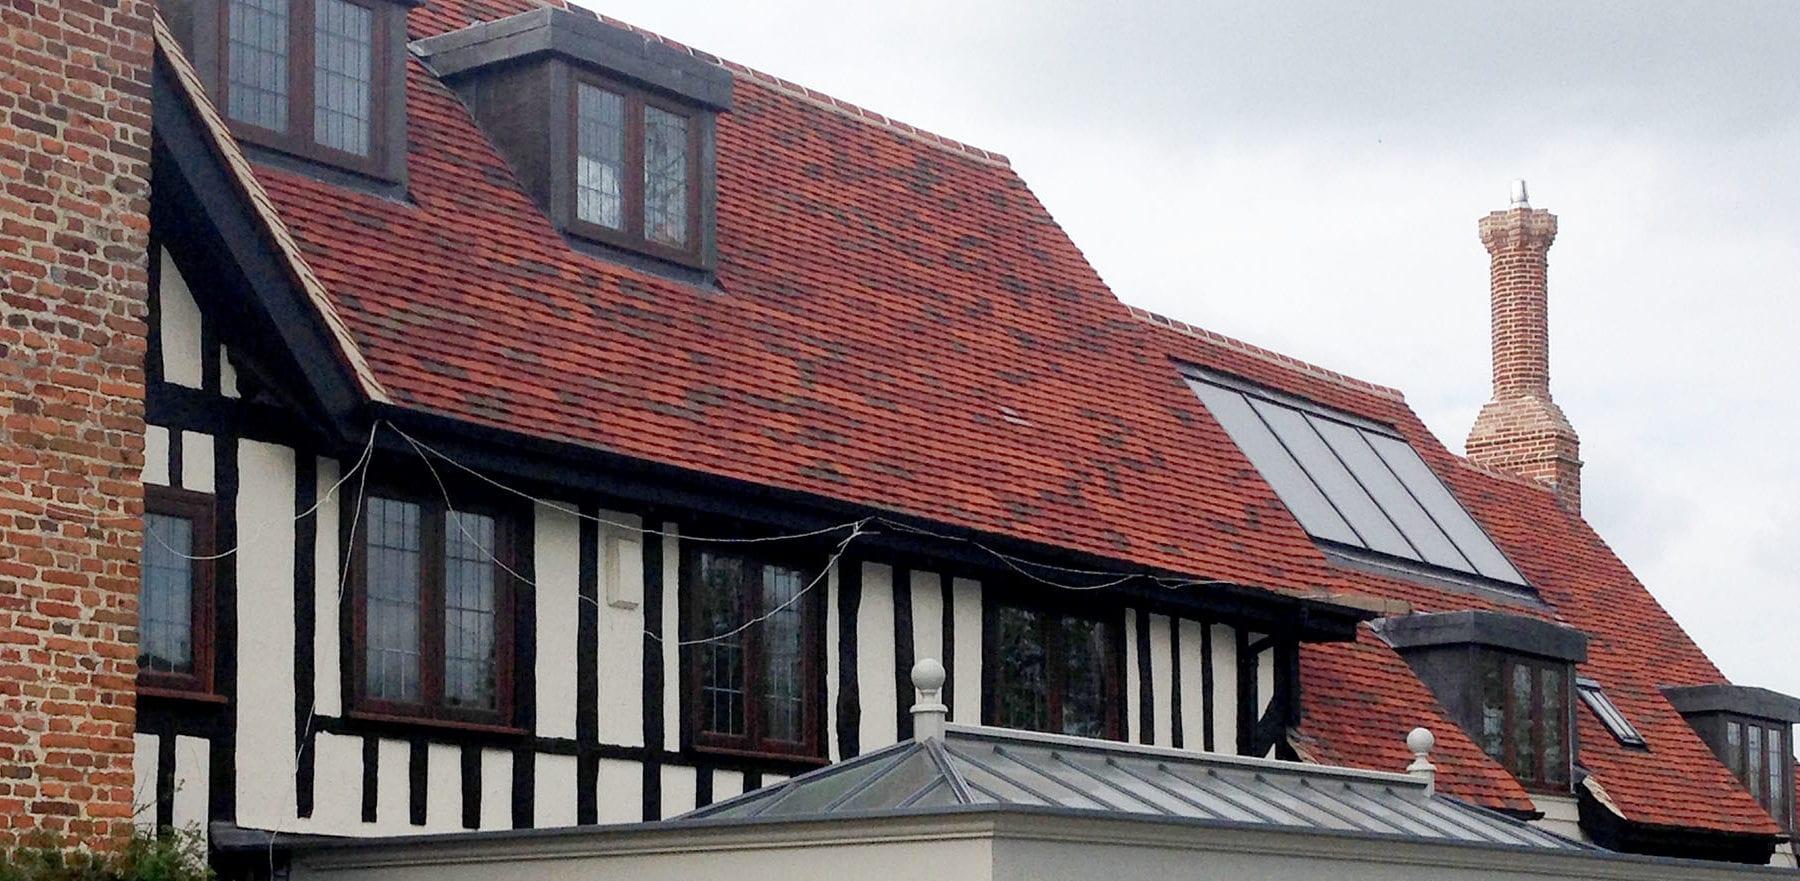 Lifestiles - Handmade Bespoke Clay Roof Tiles - Tudor Park, England 4